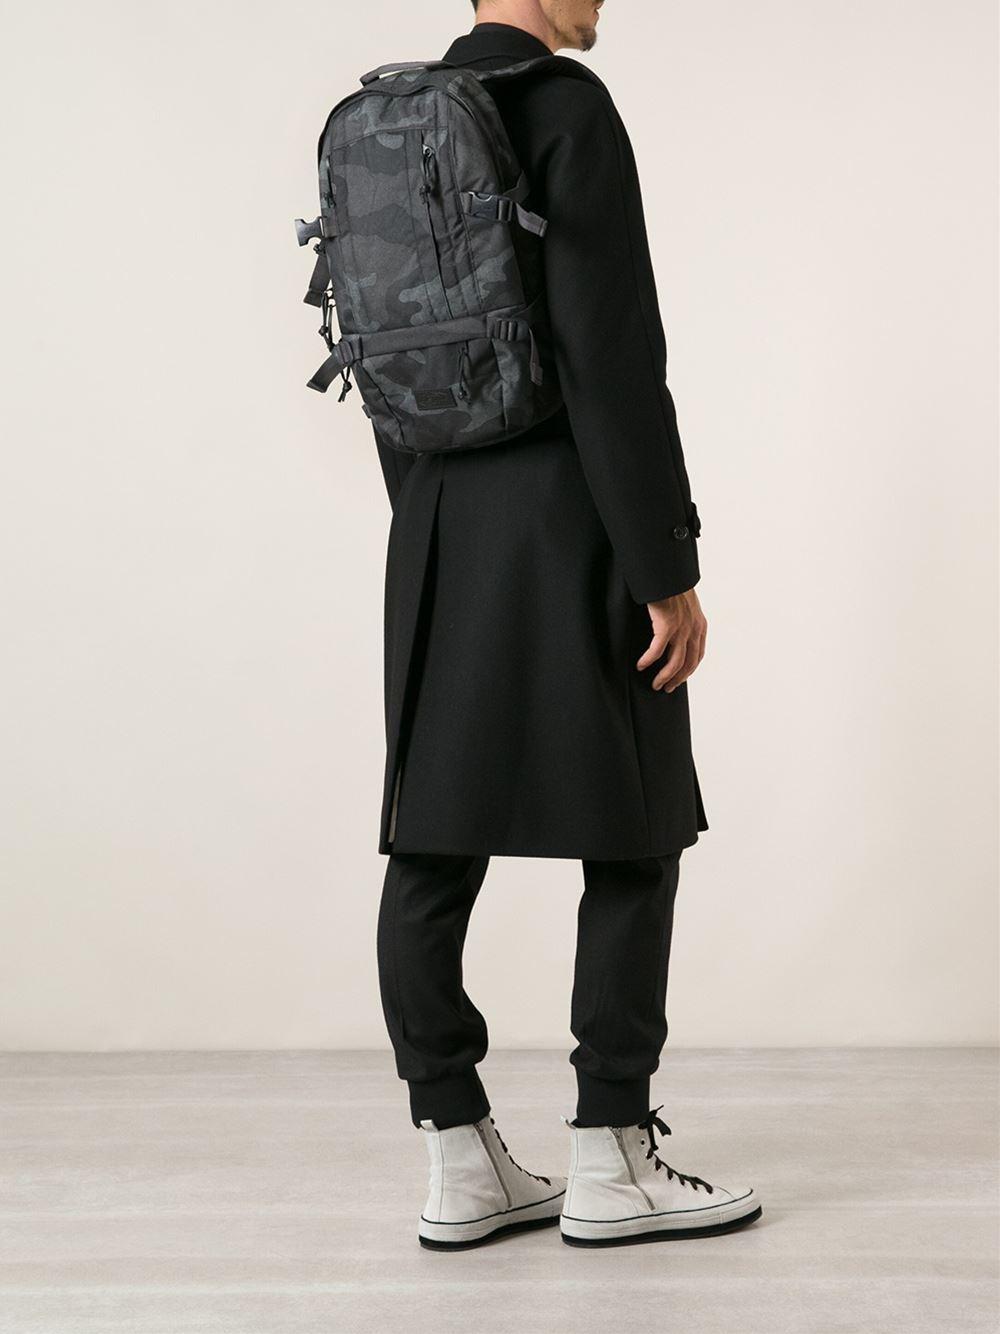 Eastpak Floid Backpack In Gray For Men Lyst